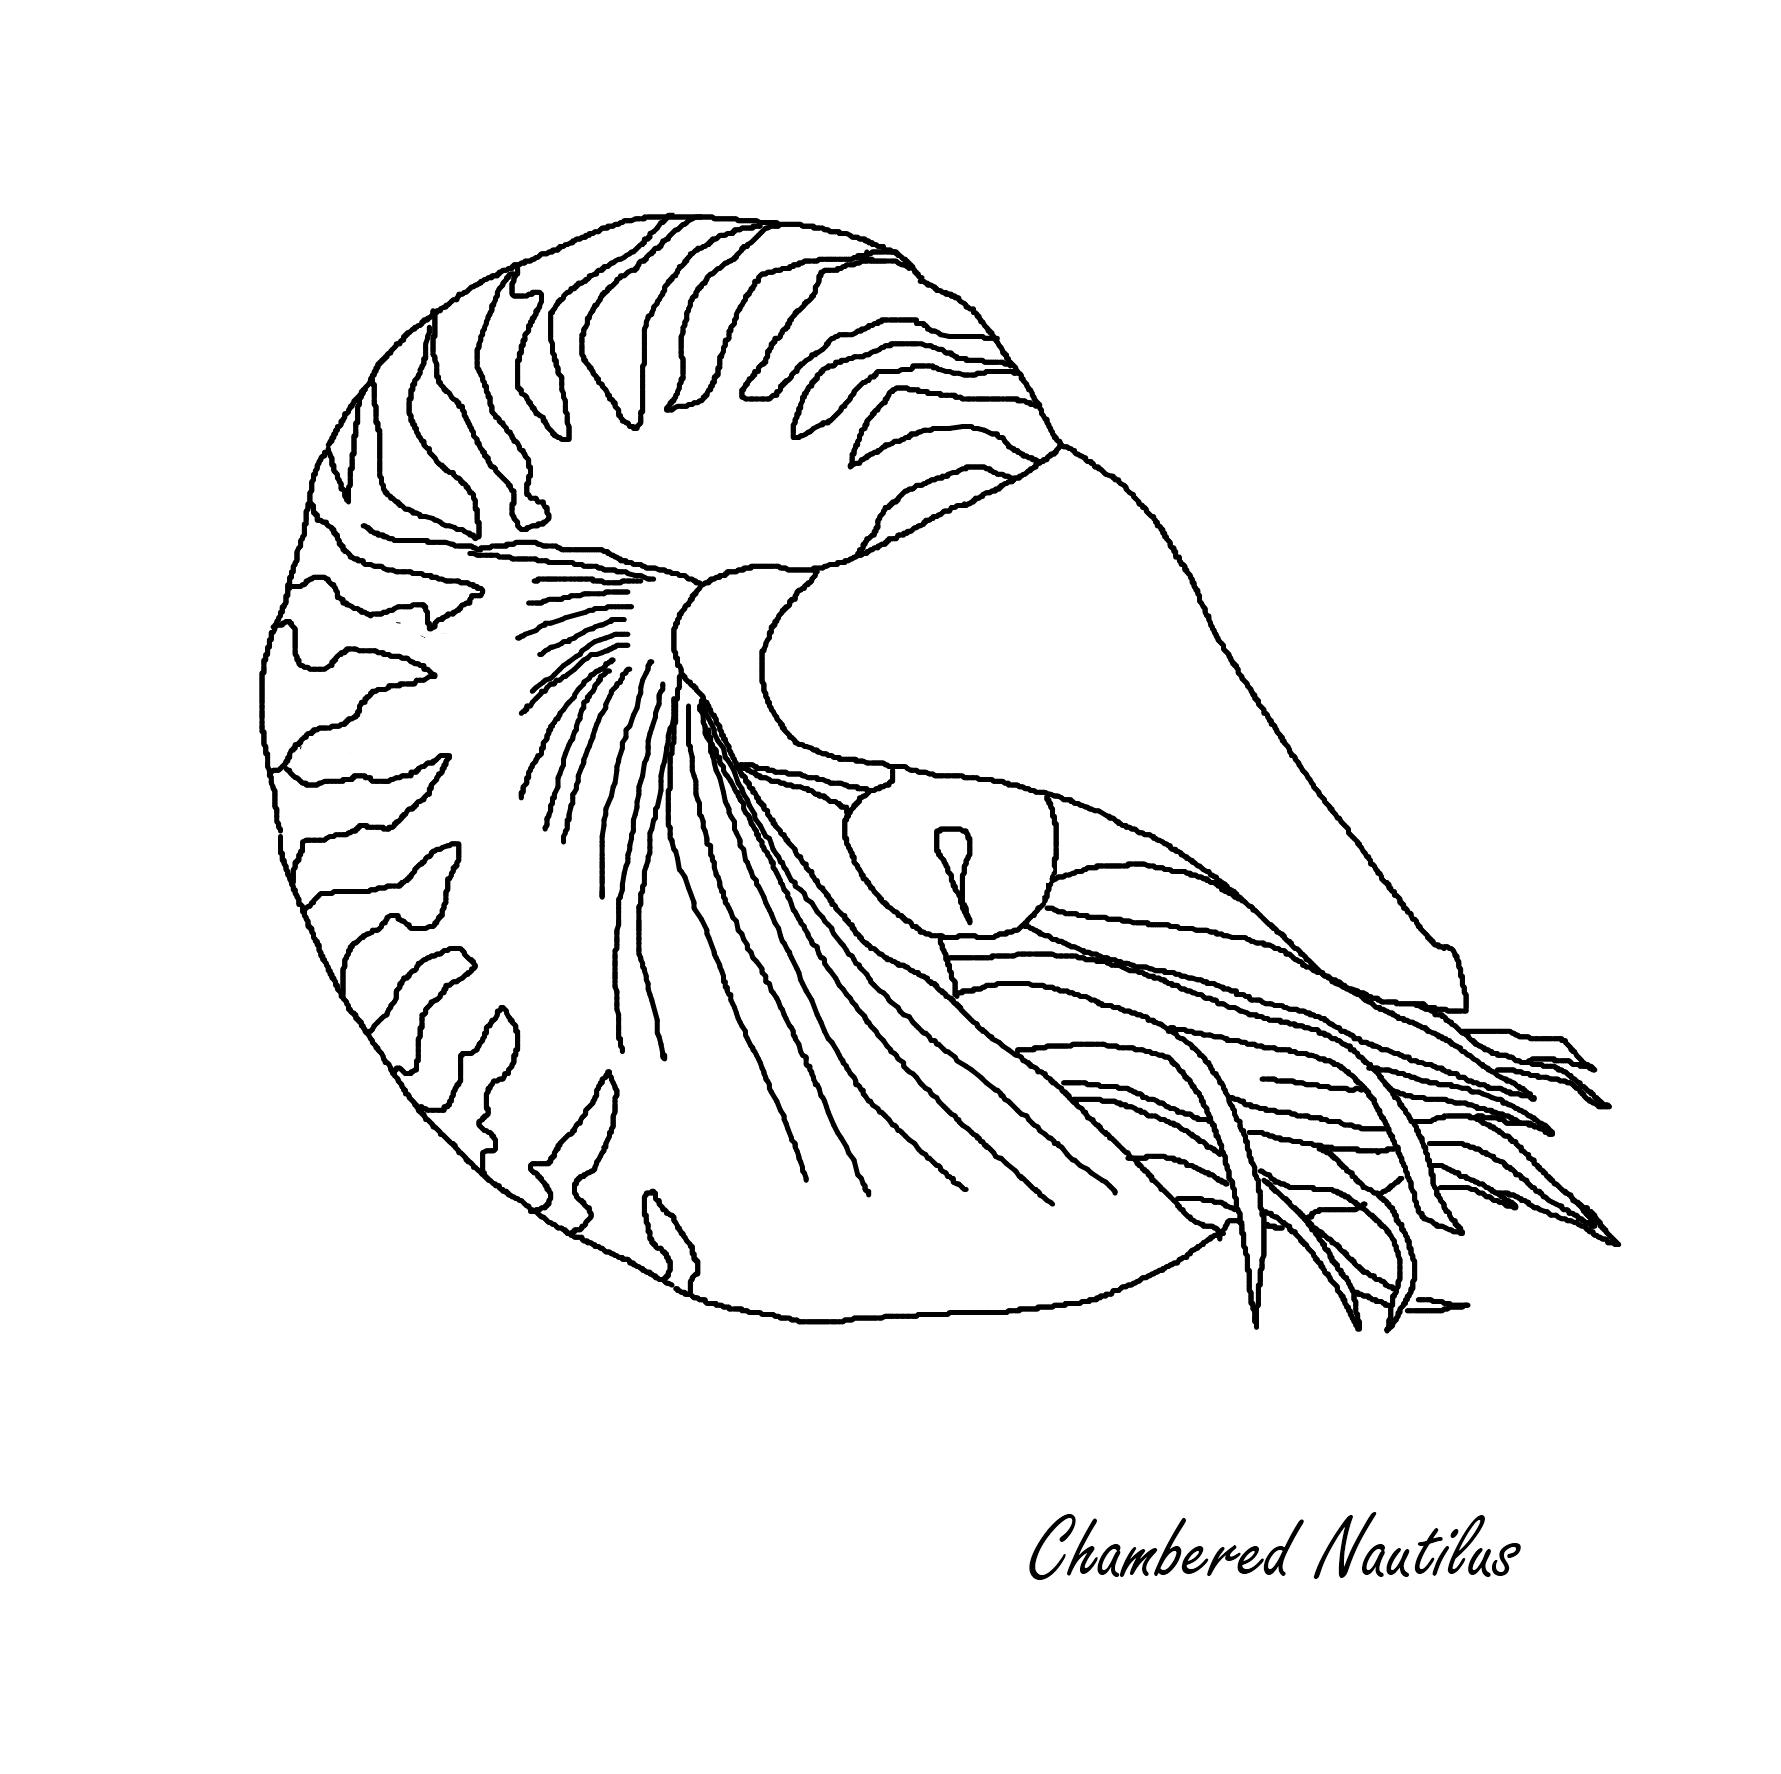 chambered nautilus drawing